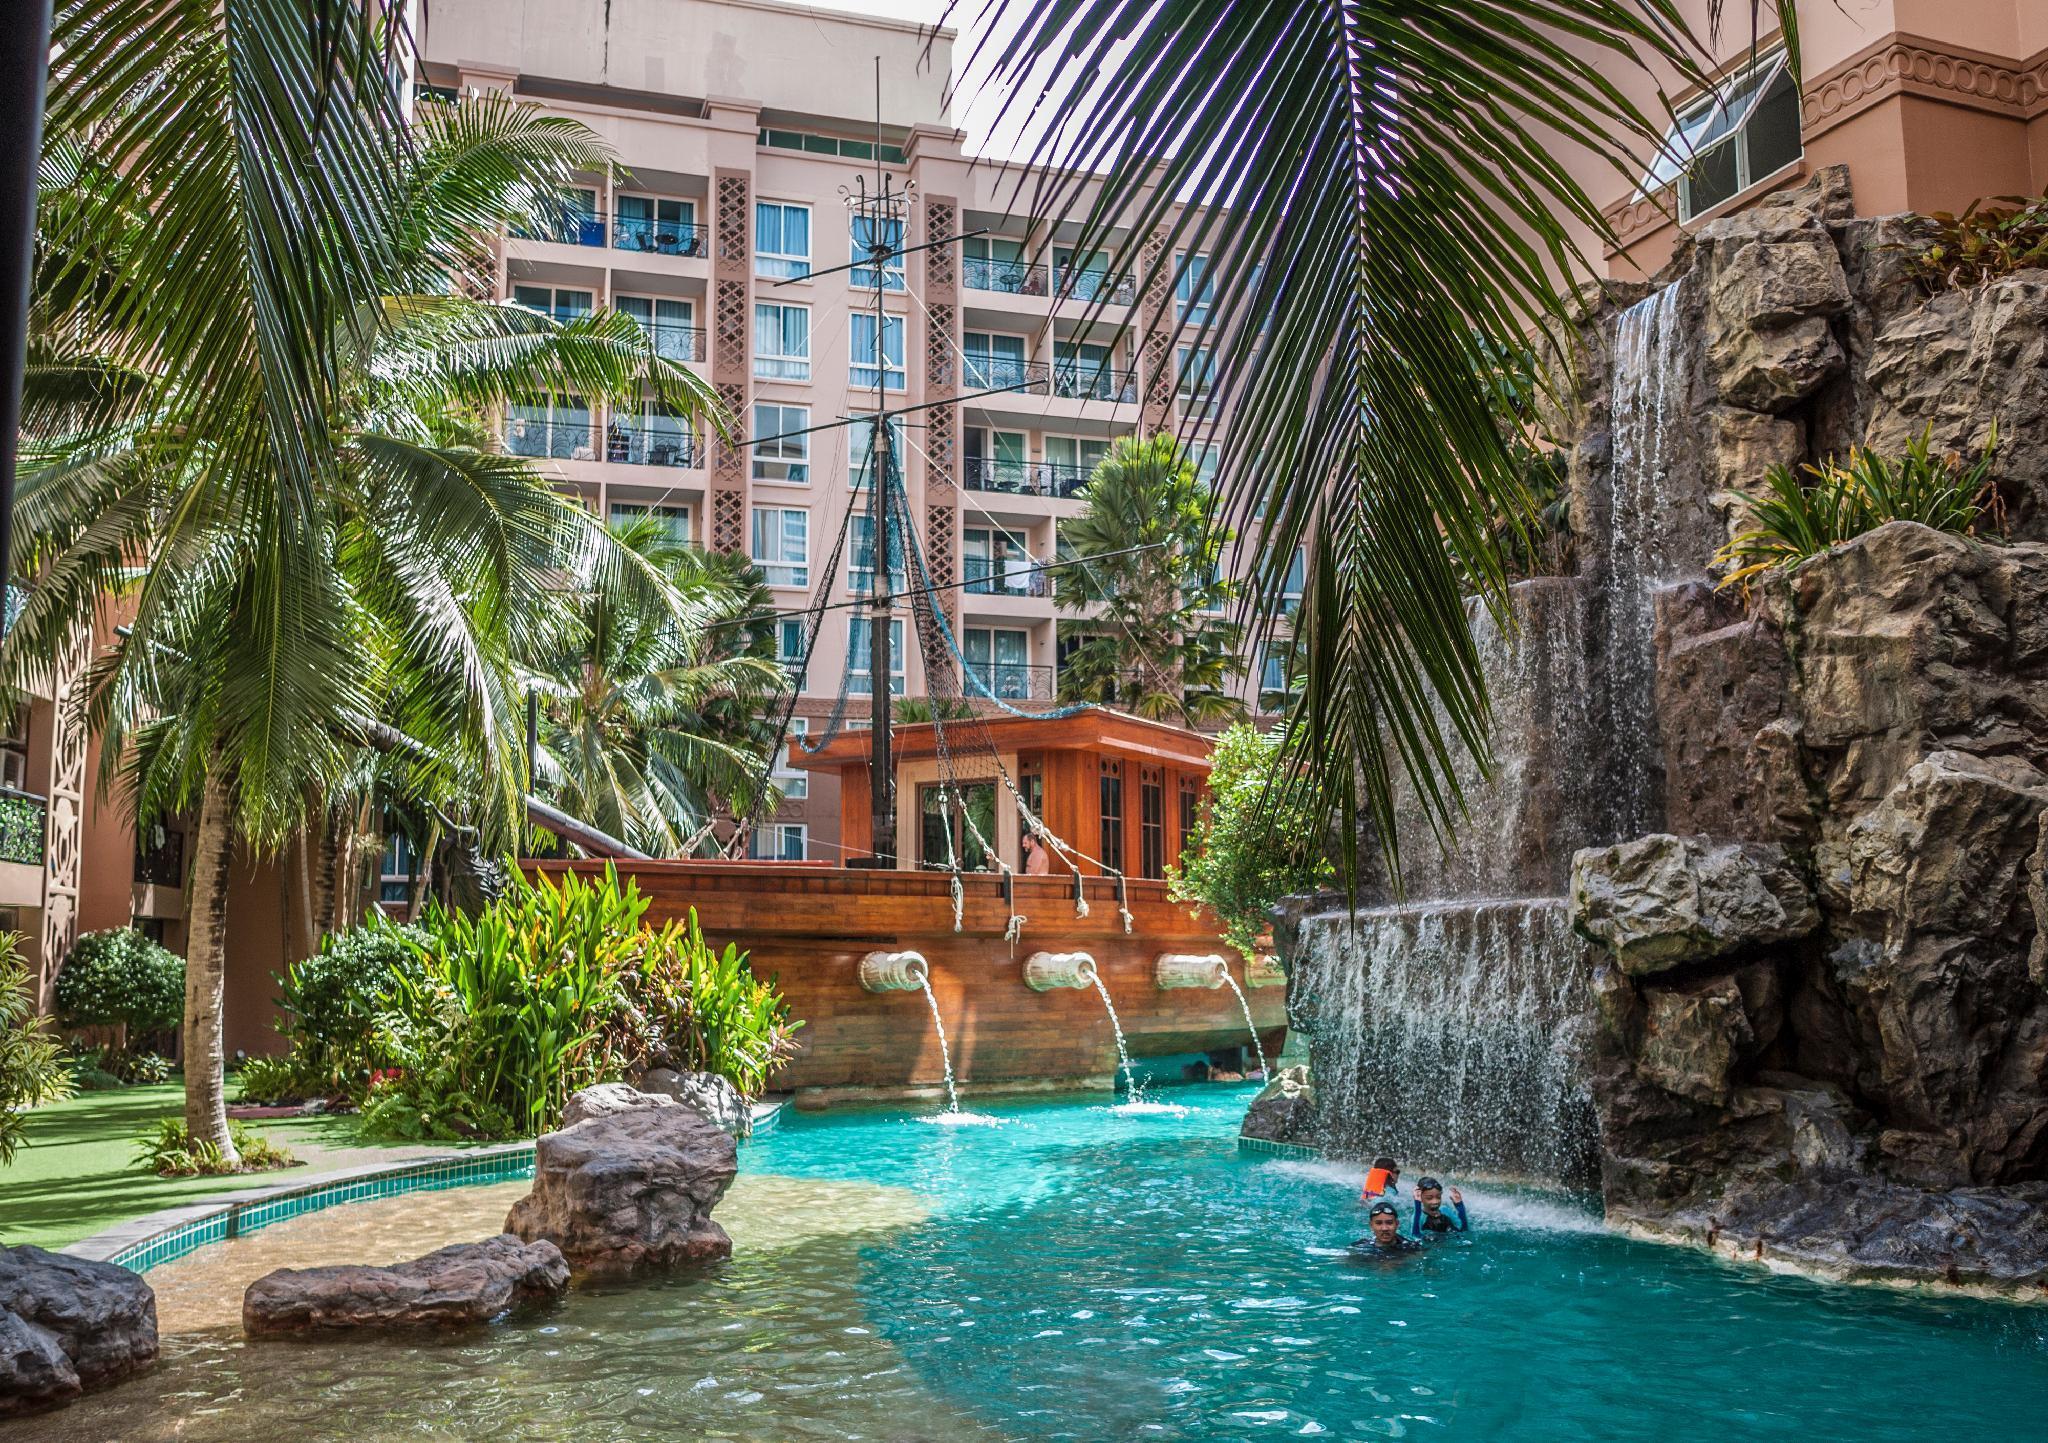 Atlantis Condo Resort Jomtien by ABG อพาร์ตเมนต์ 1 ห้องนอน 1 ห้องน้ำส่วนตัว ขนาด 36 ตร.ม. – หาดจอมเทียน